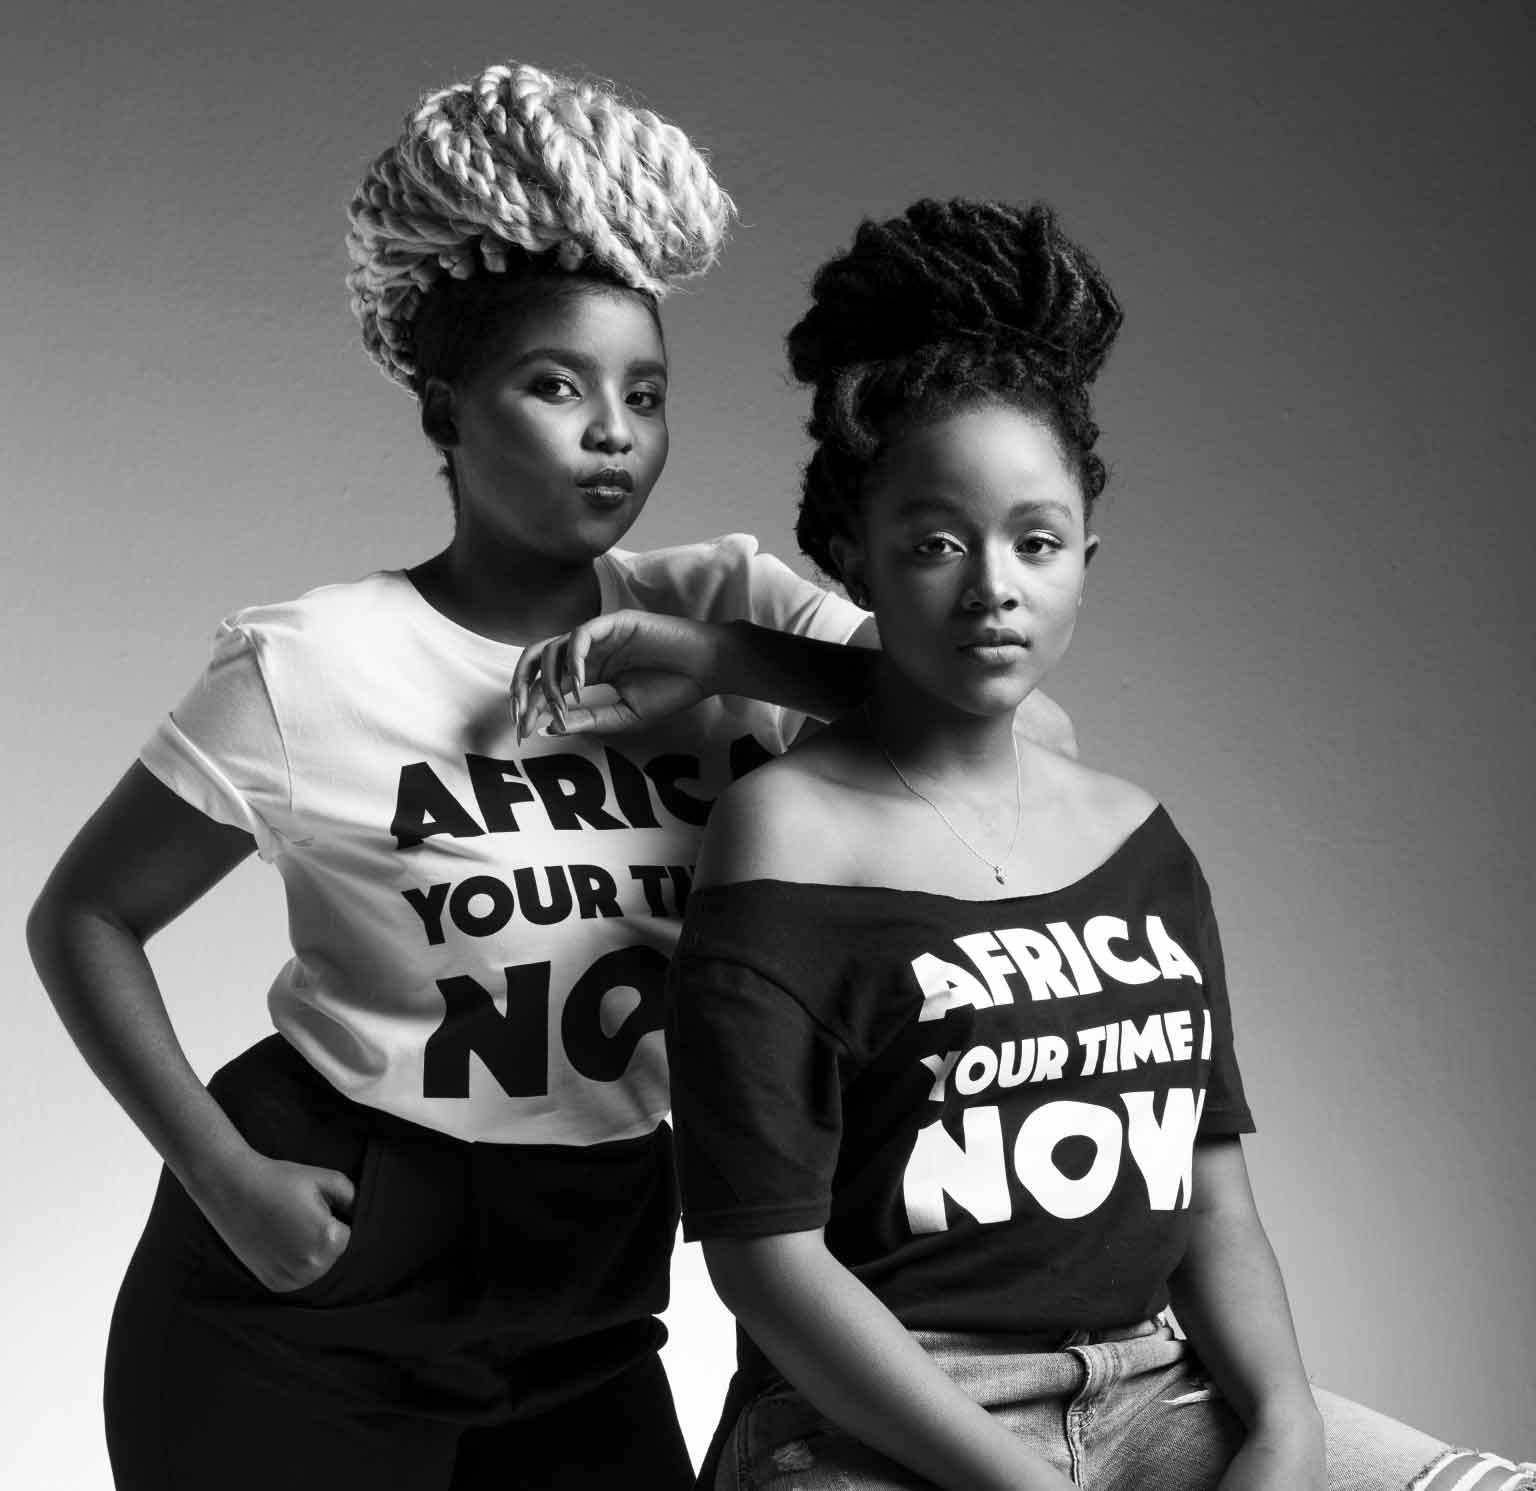 @blackboard_africa